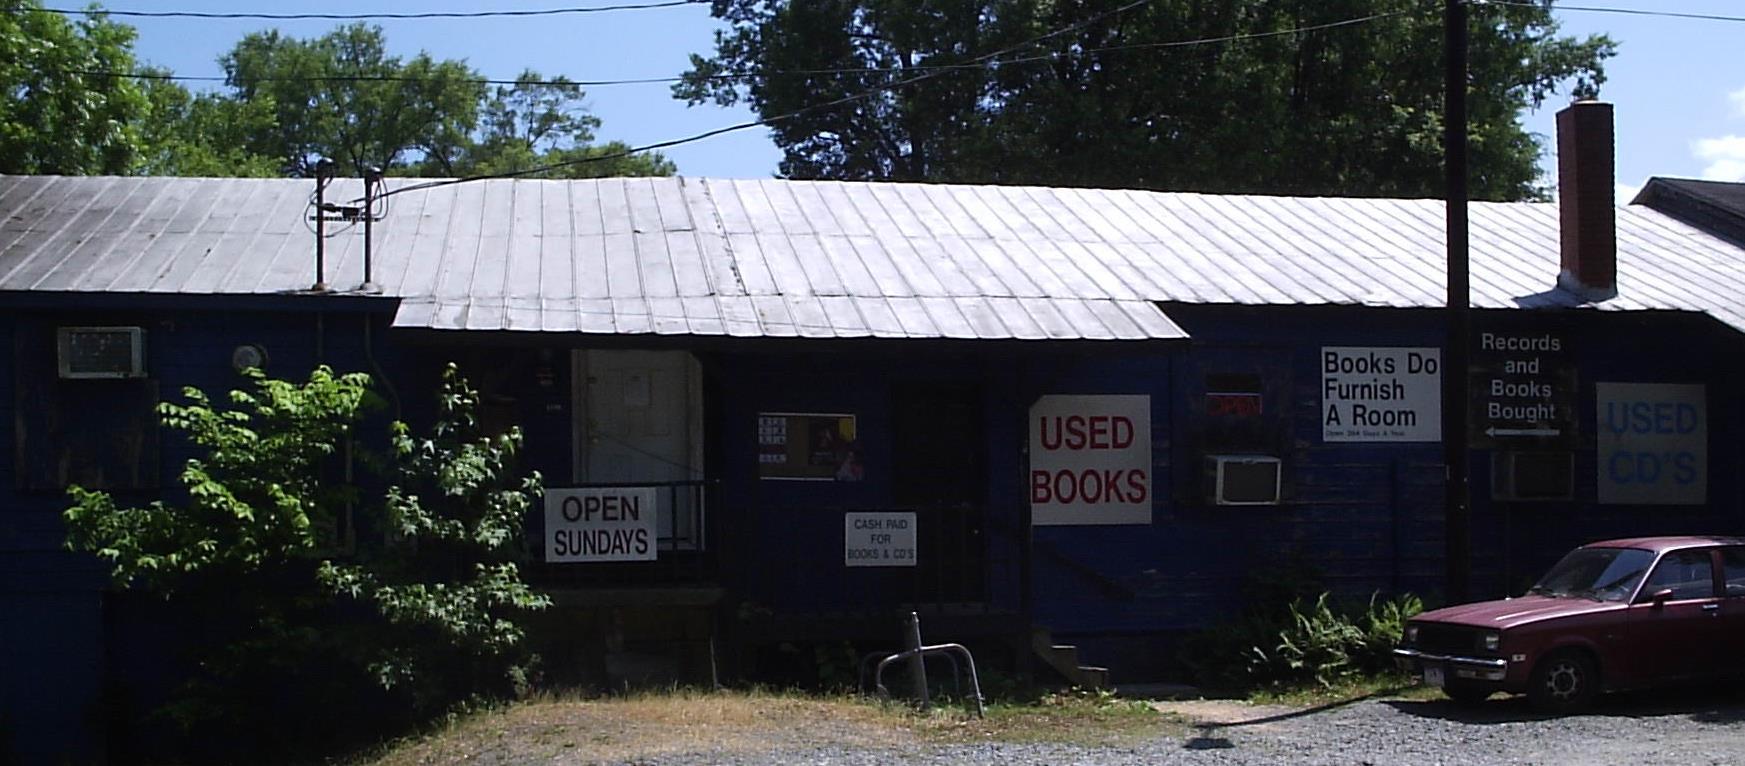 Books Do Furnish A Room In Durham Nc